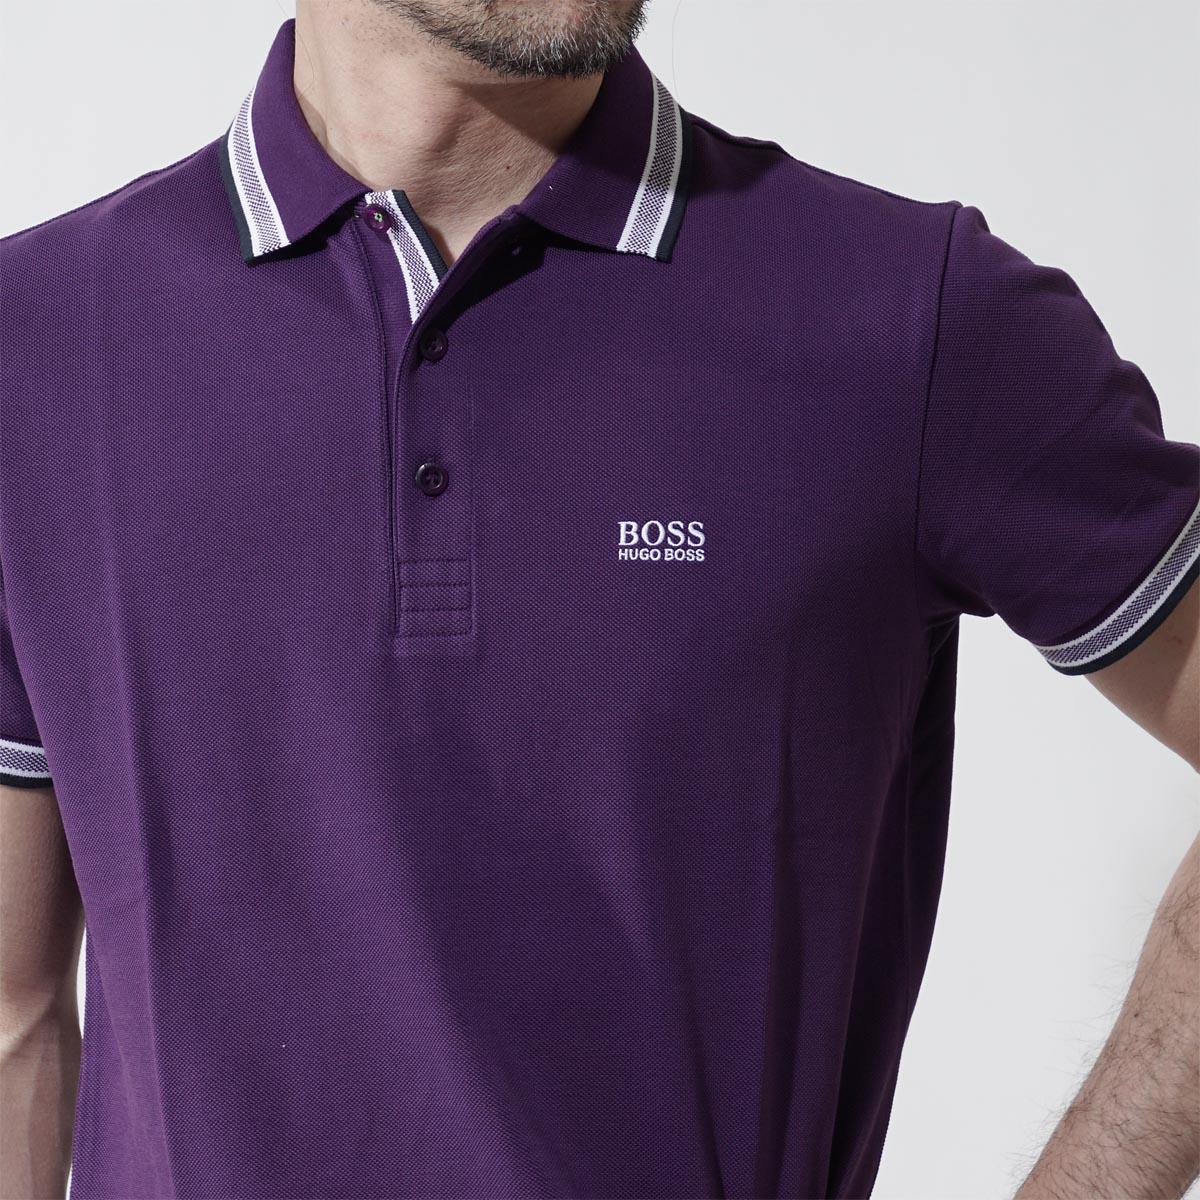 74fdc193 Boss Hugo Boss /BOSS HUGOBOSS polo shirt